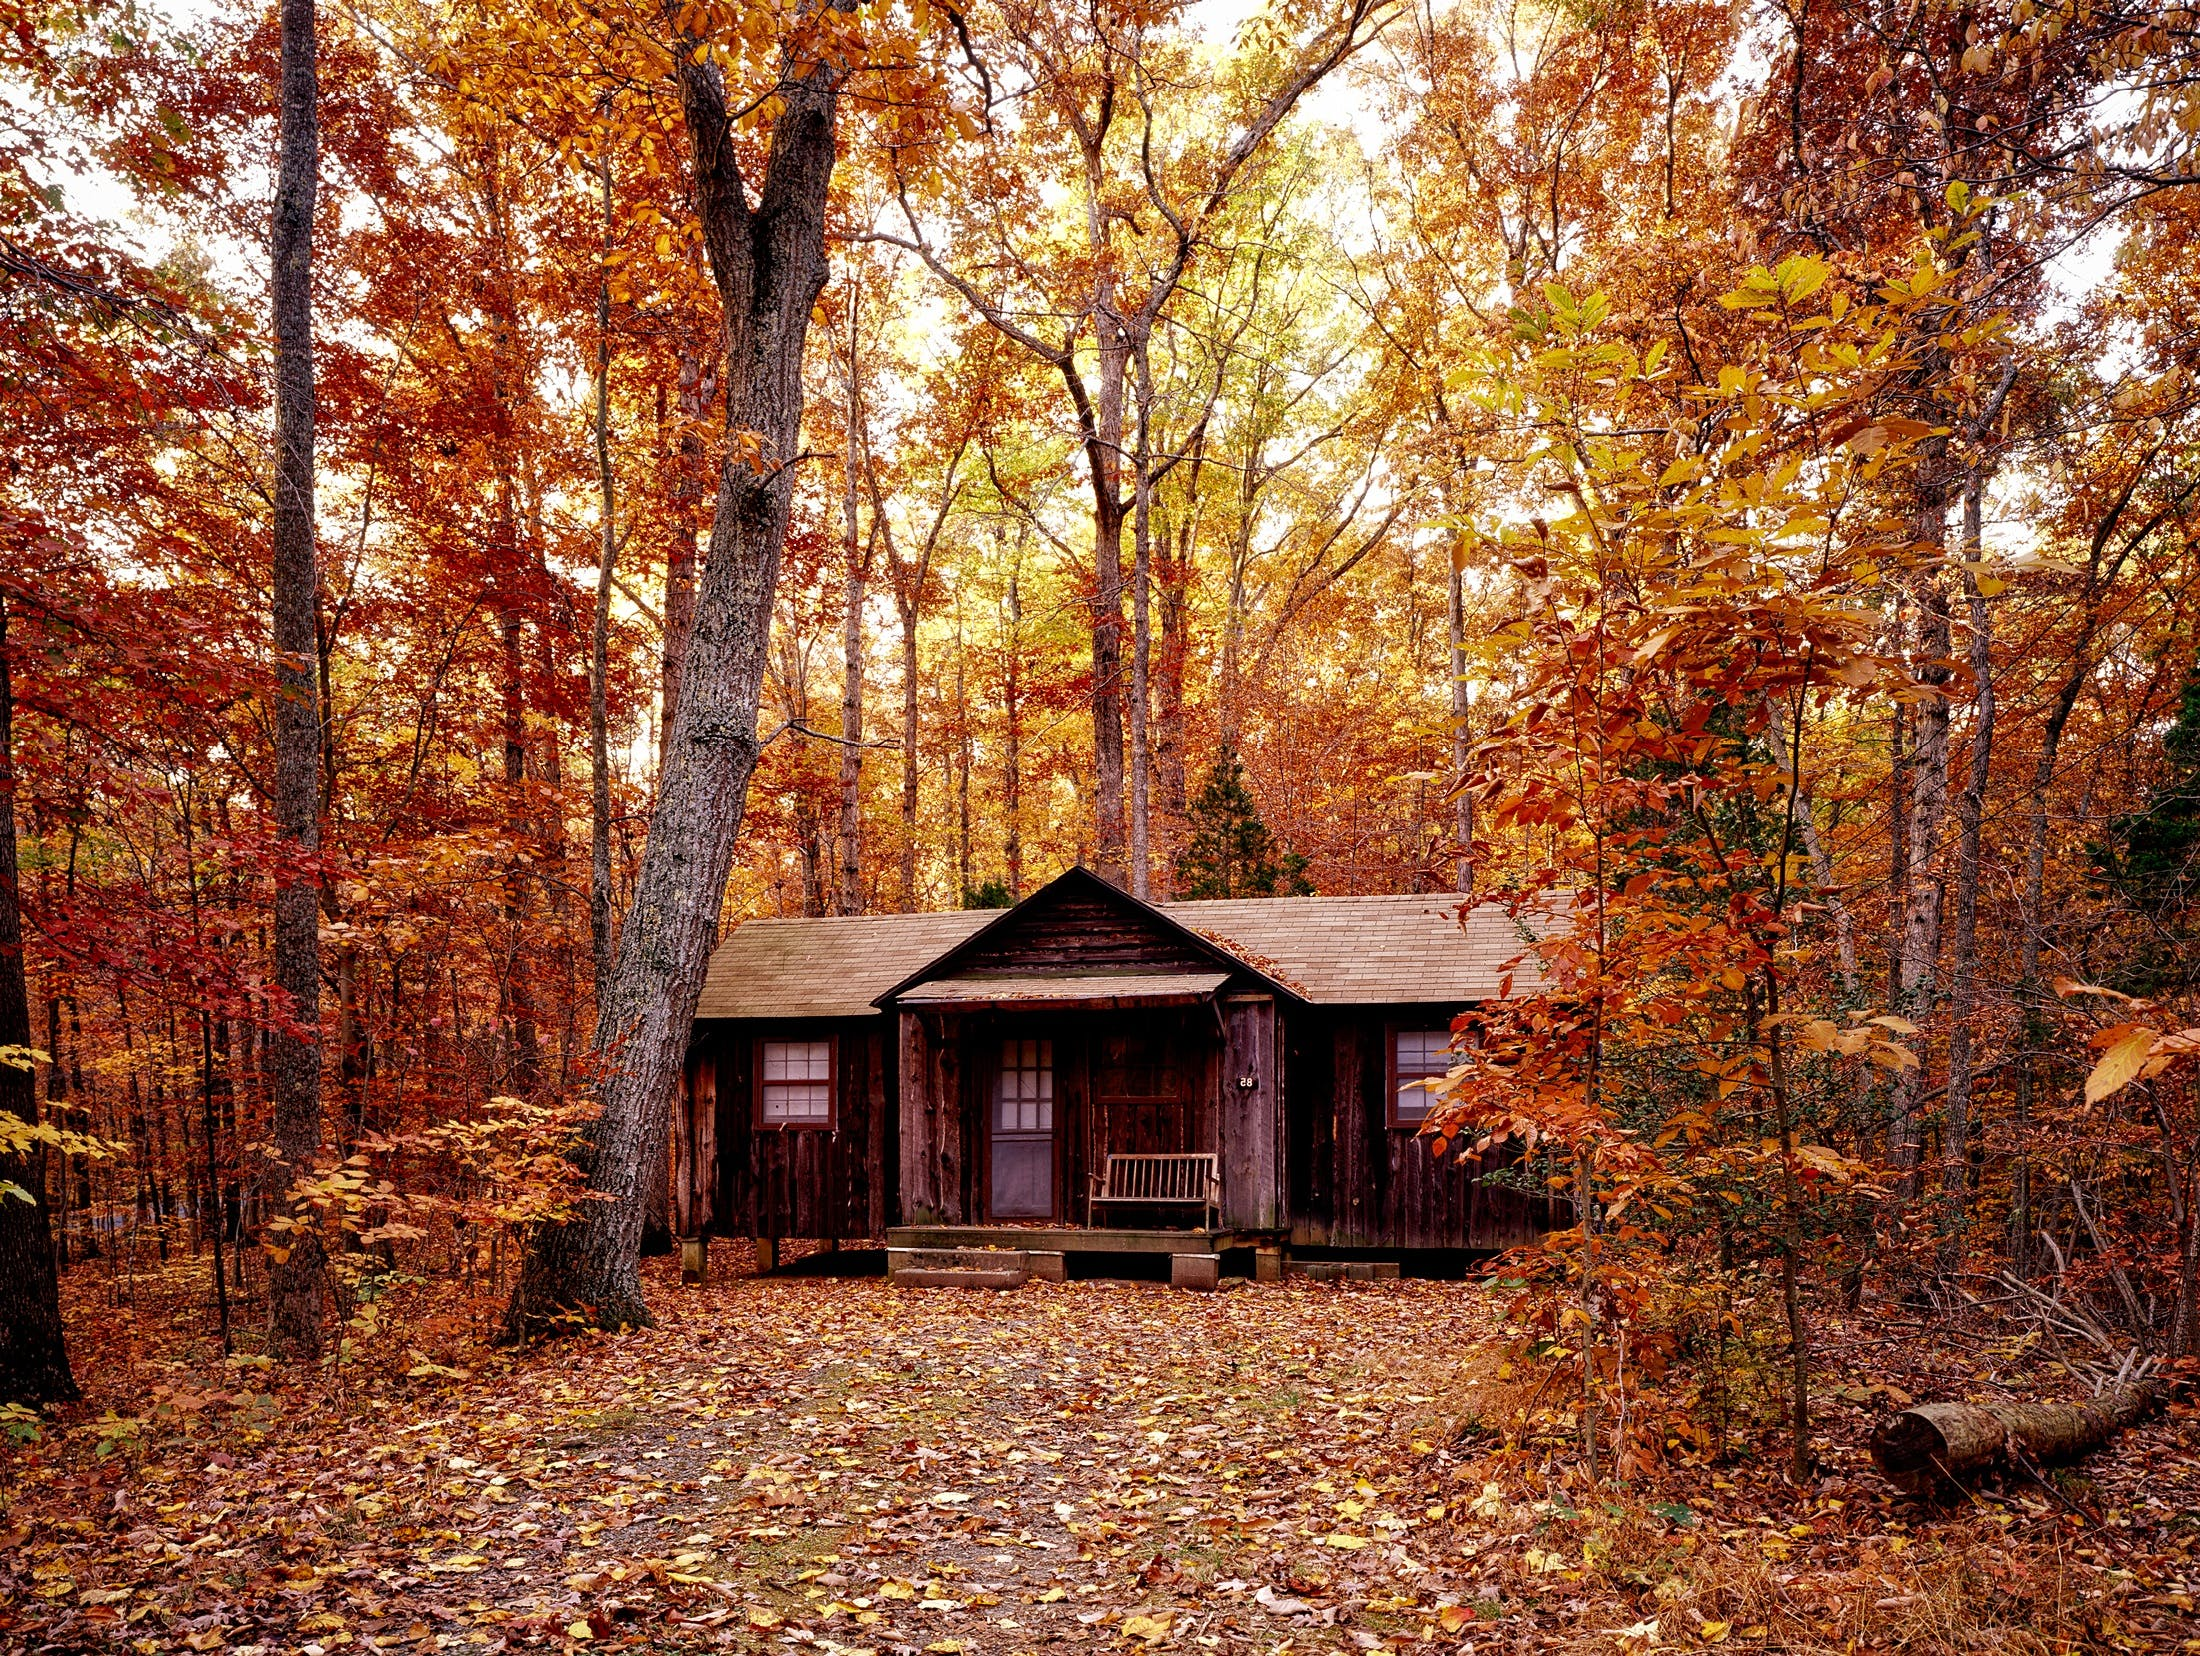 Brown Wooden House on Orange Leaf Trees